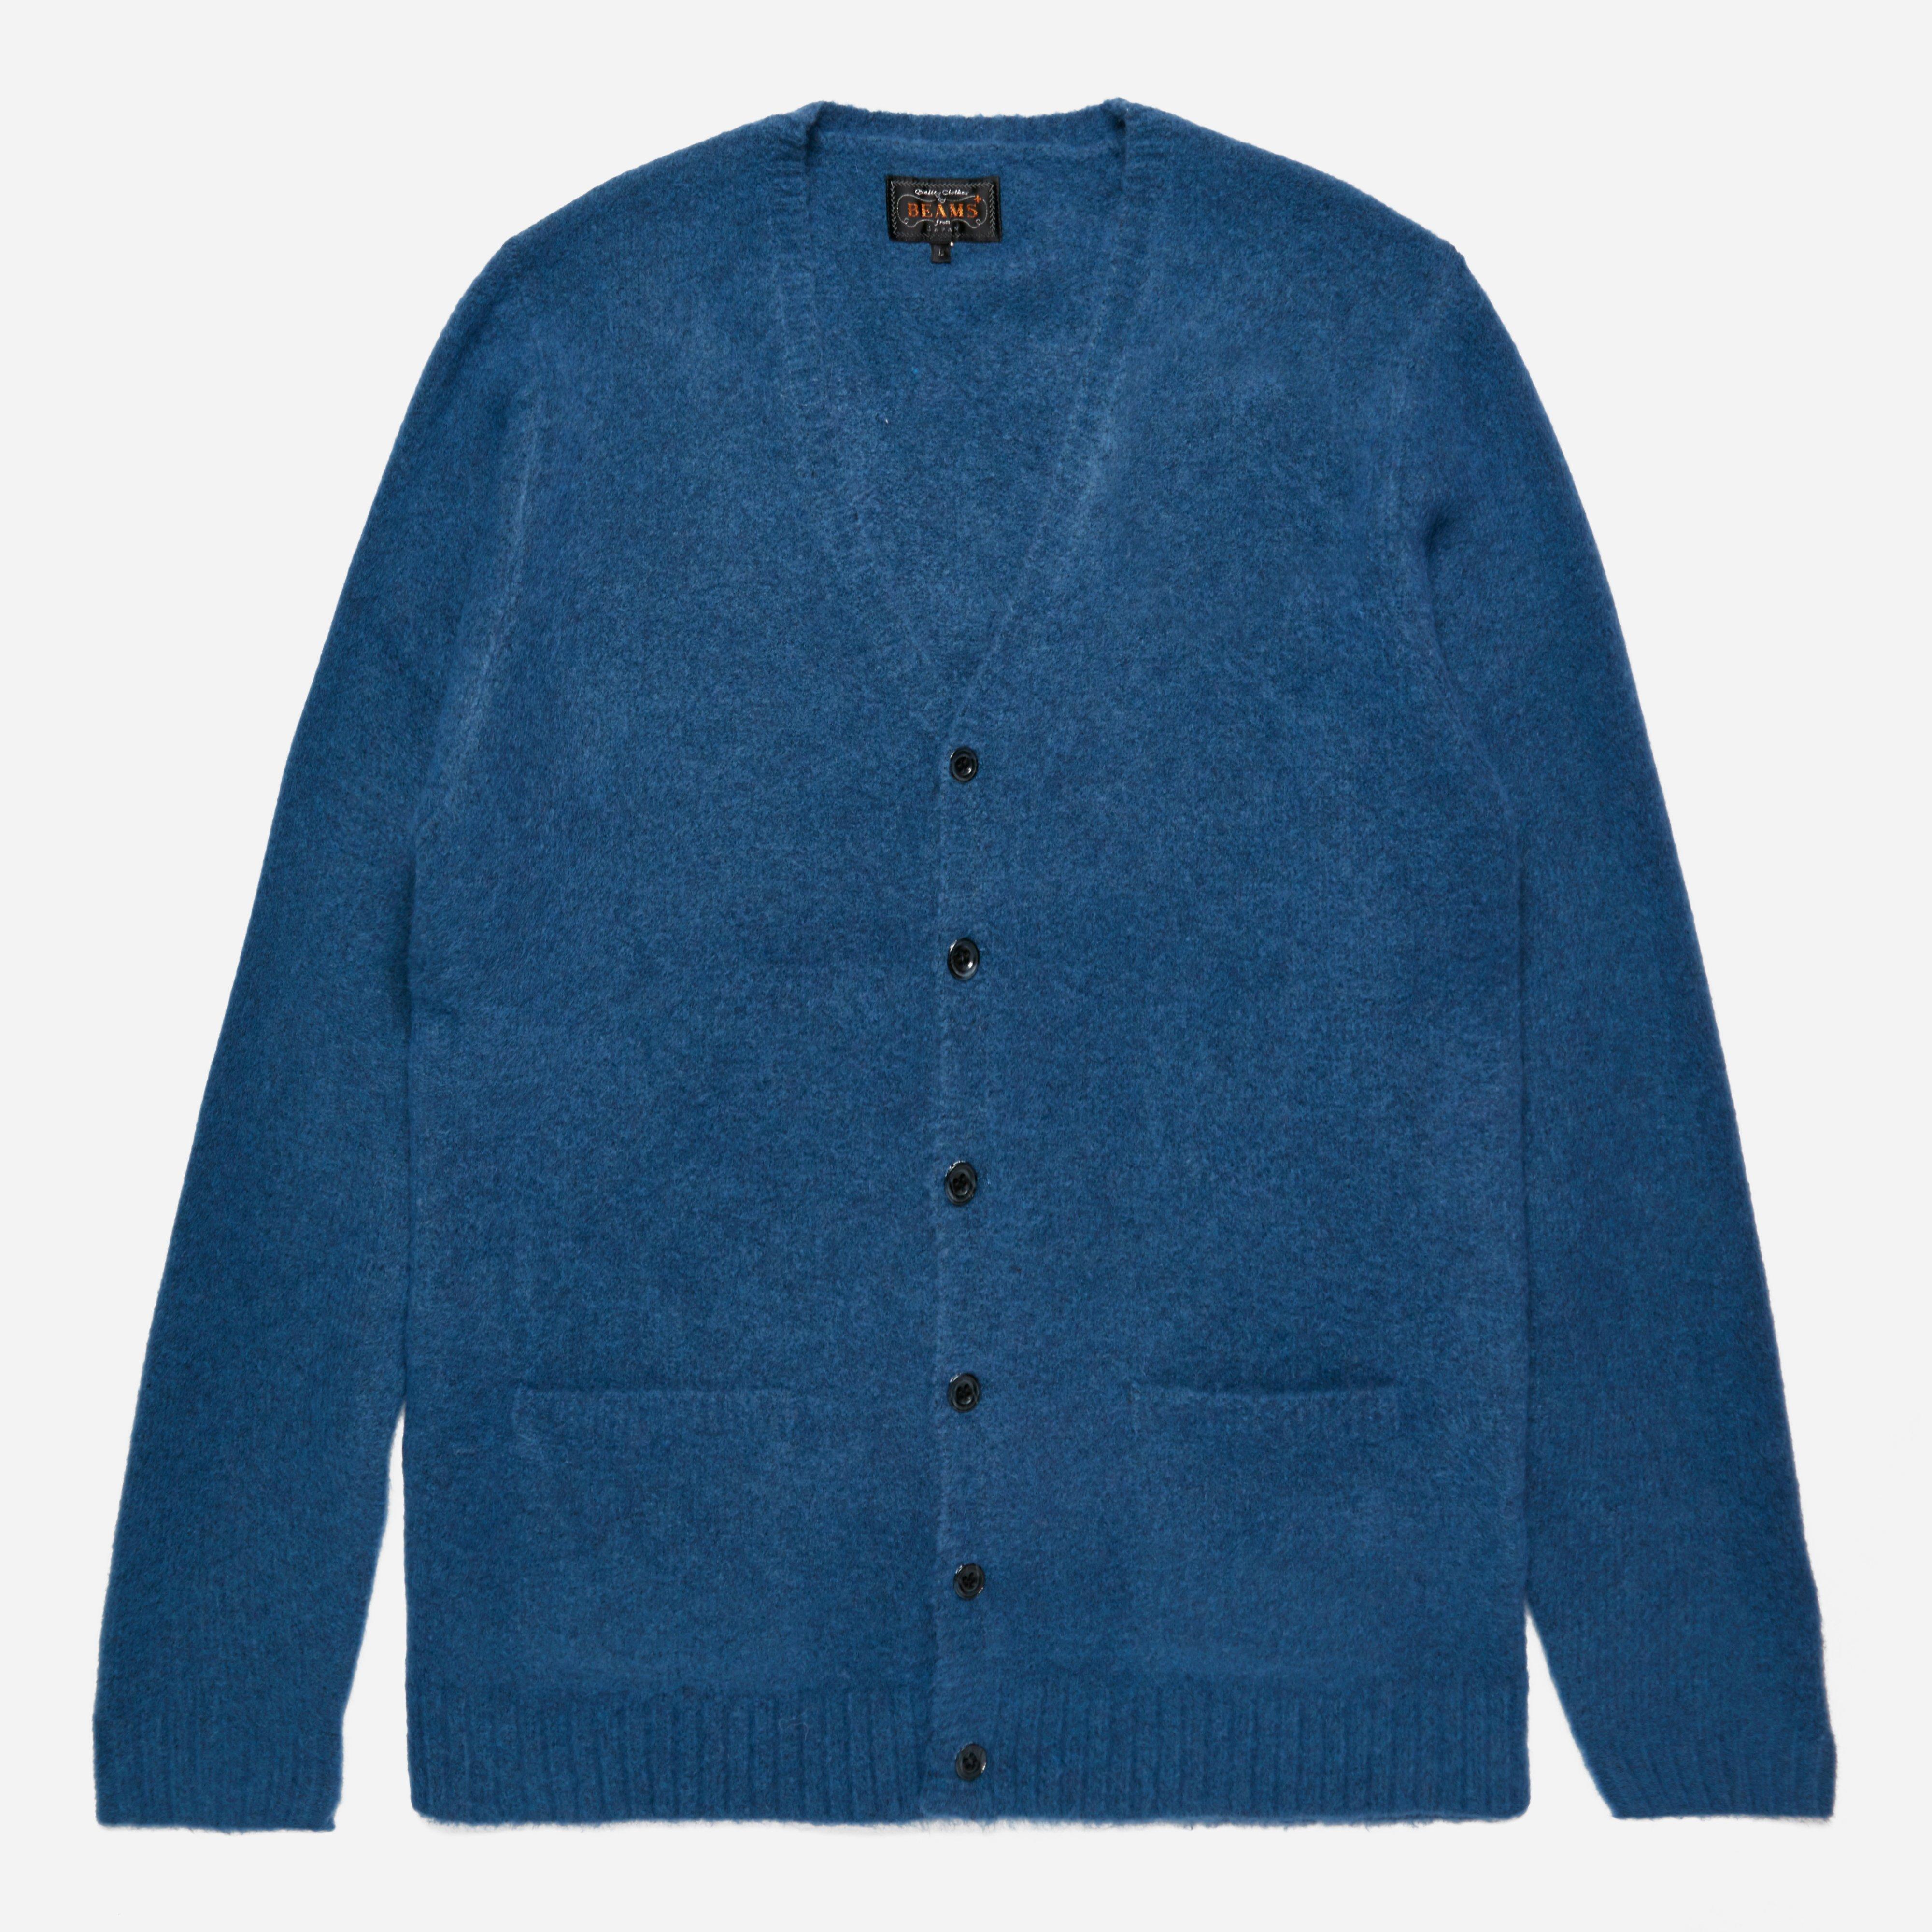 Beams Plus Stretch Knit Cardigan